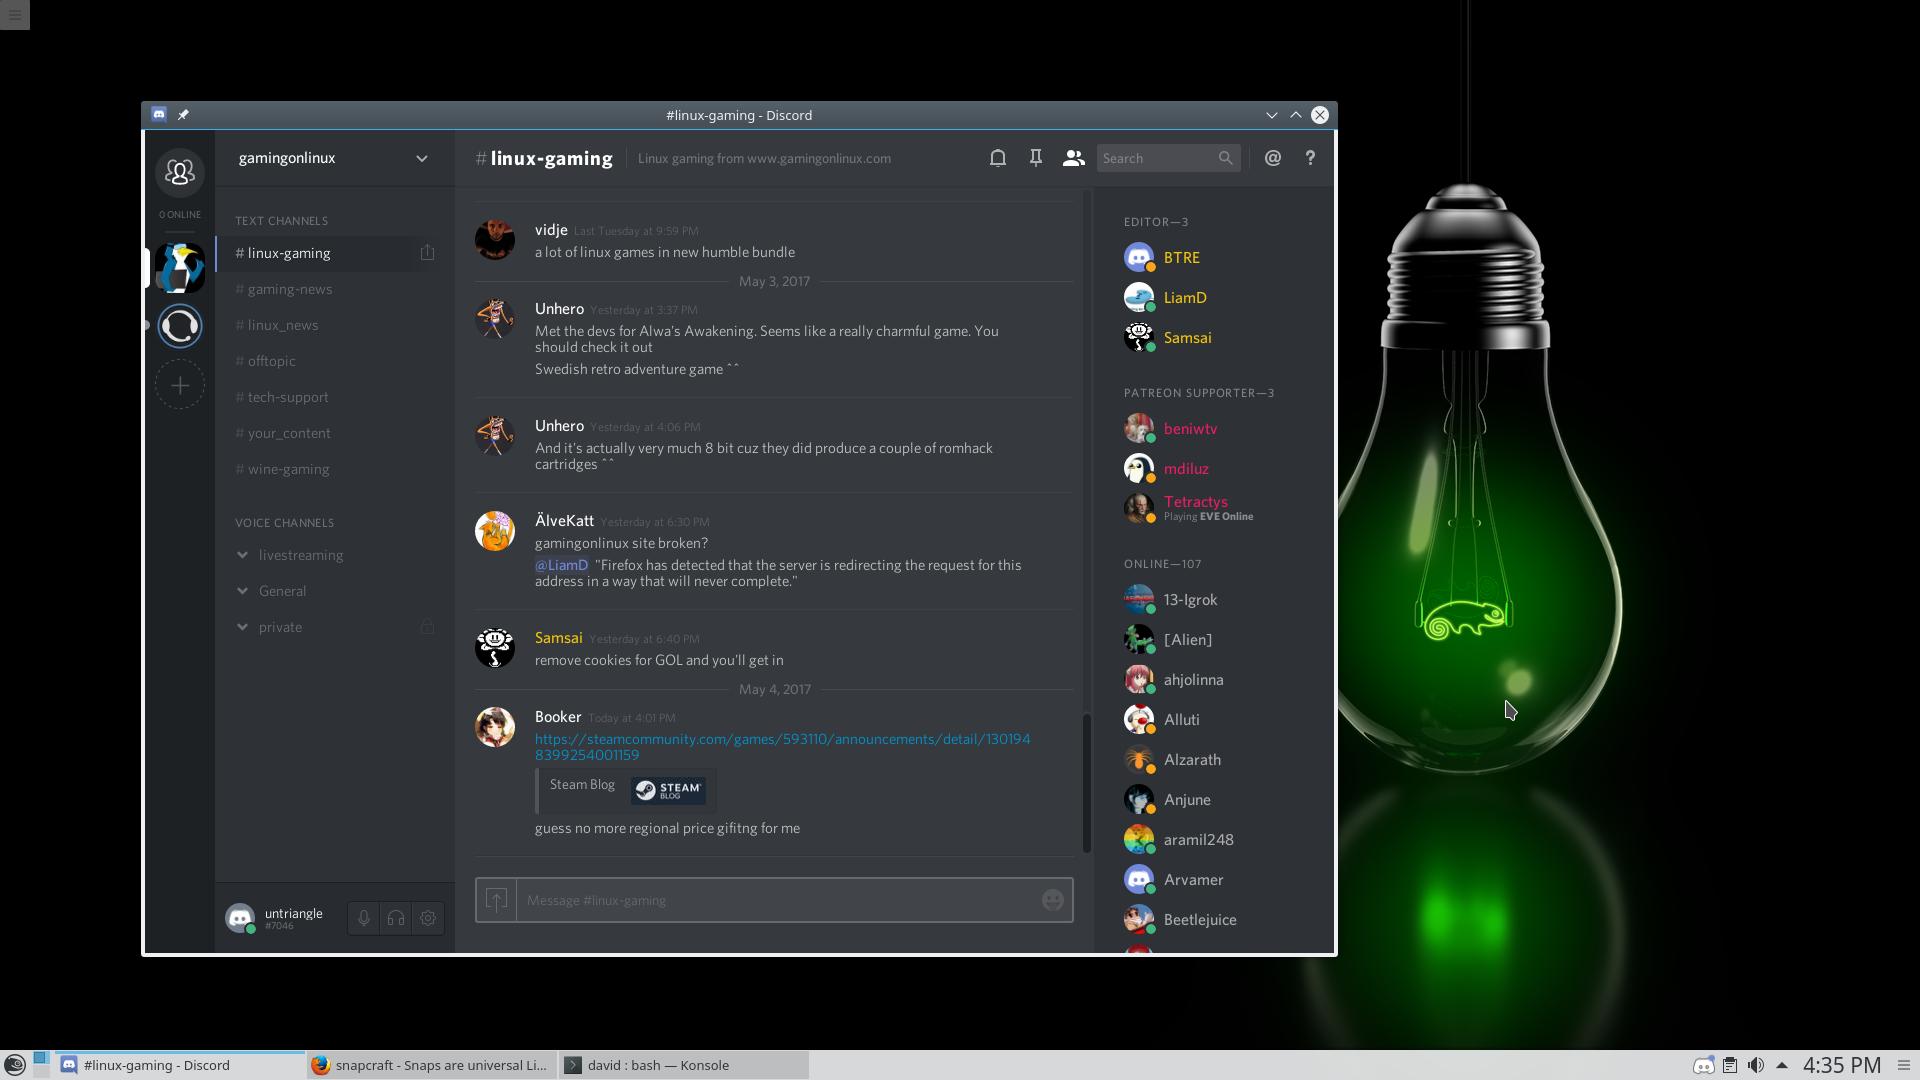 how to download discord oin ubuntu